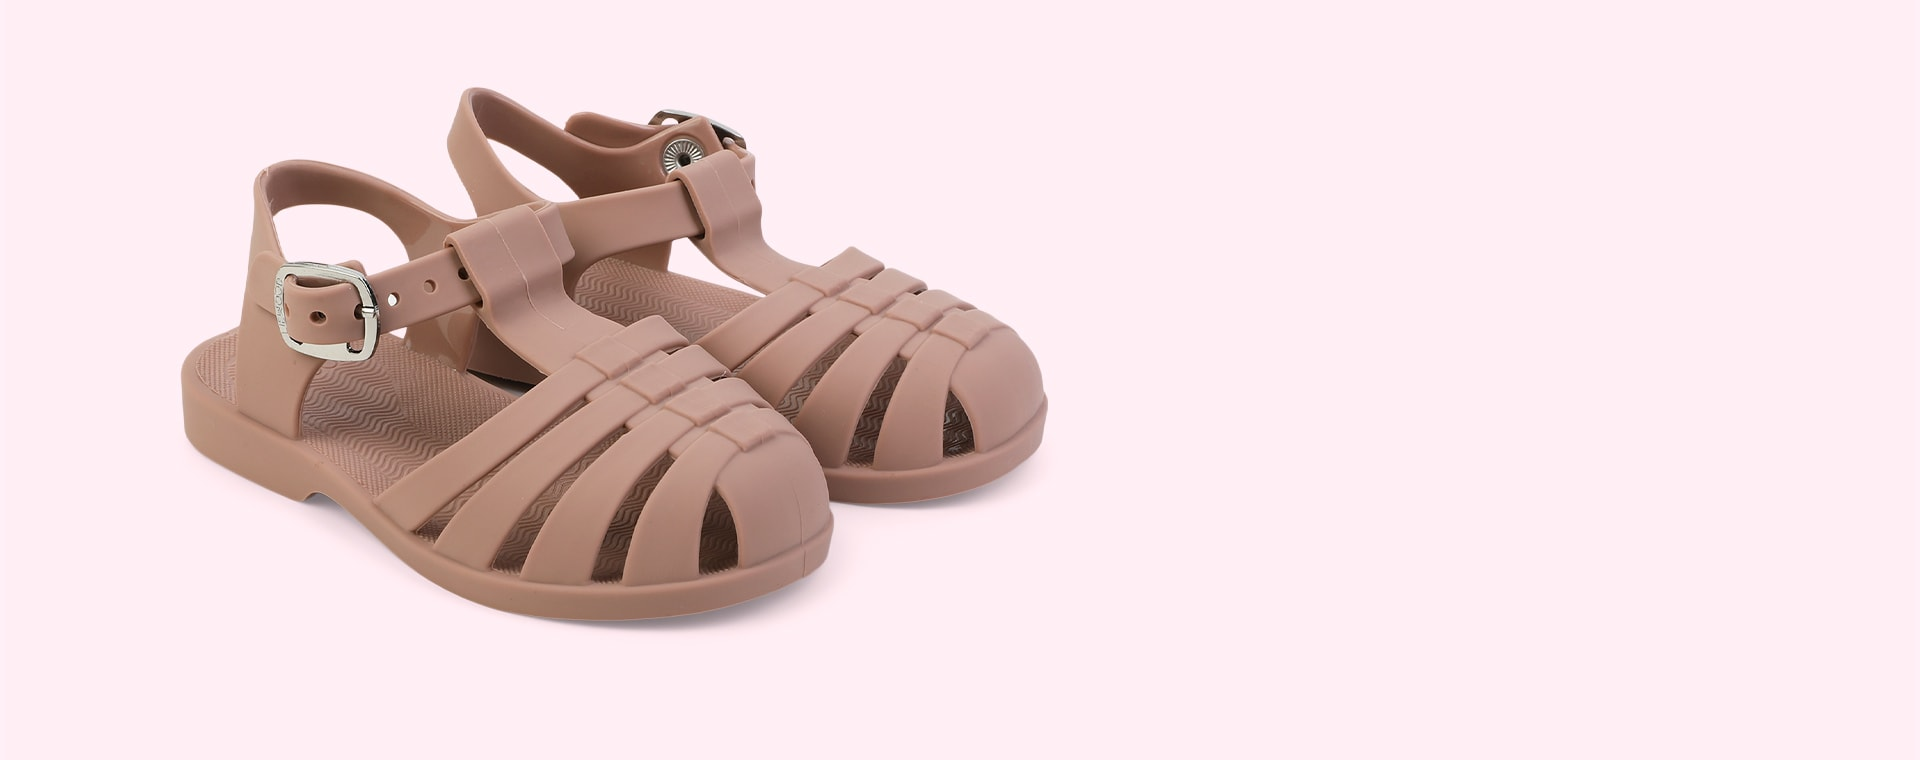 New Dark Rose Liewood Bre Jelly Sandals